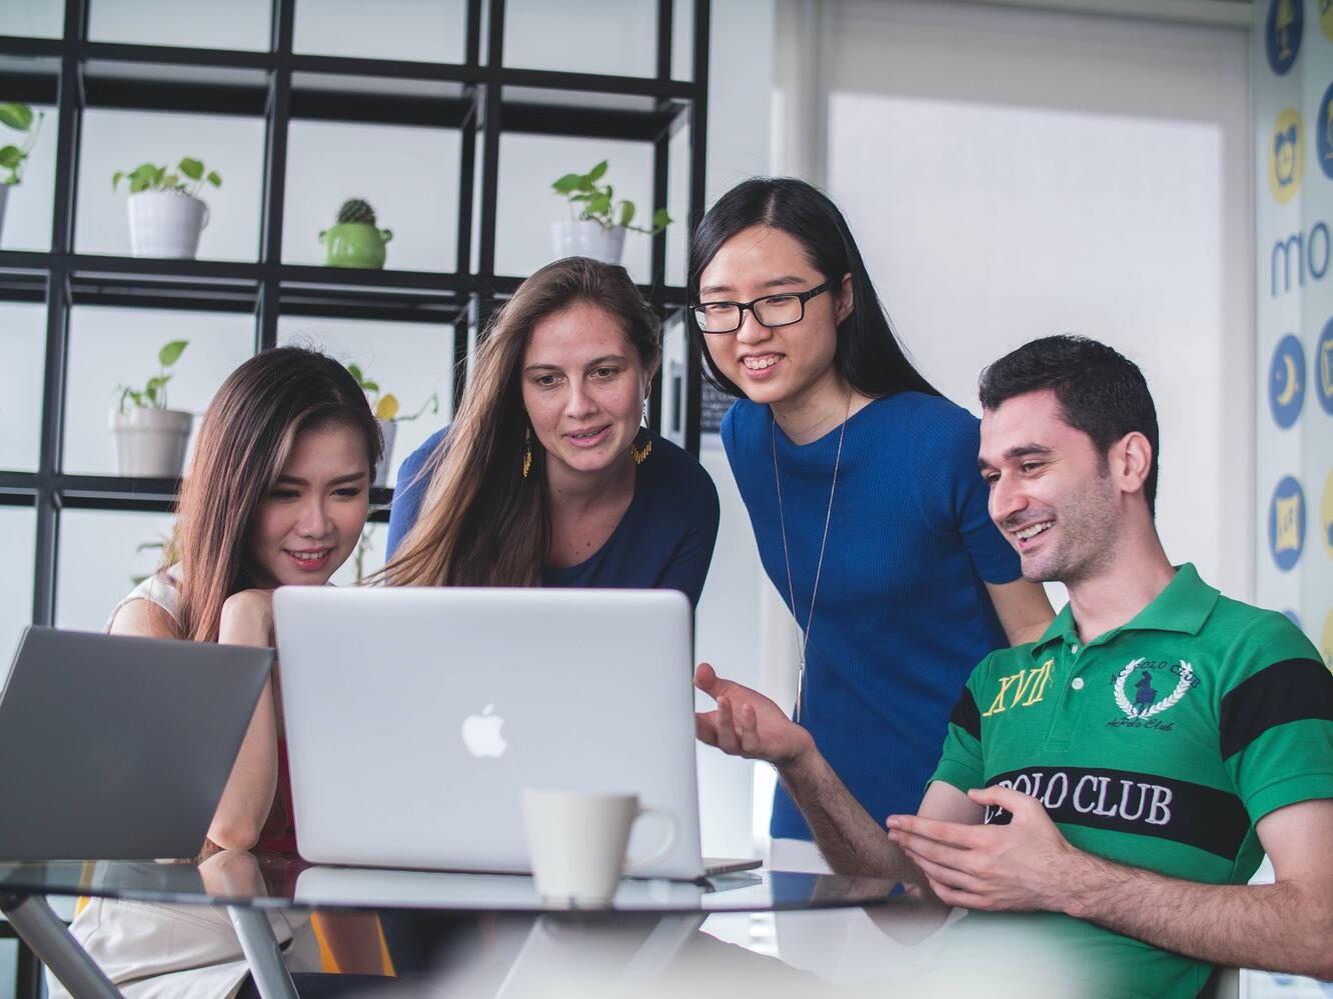 Millennials Value Collaboration